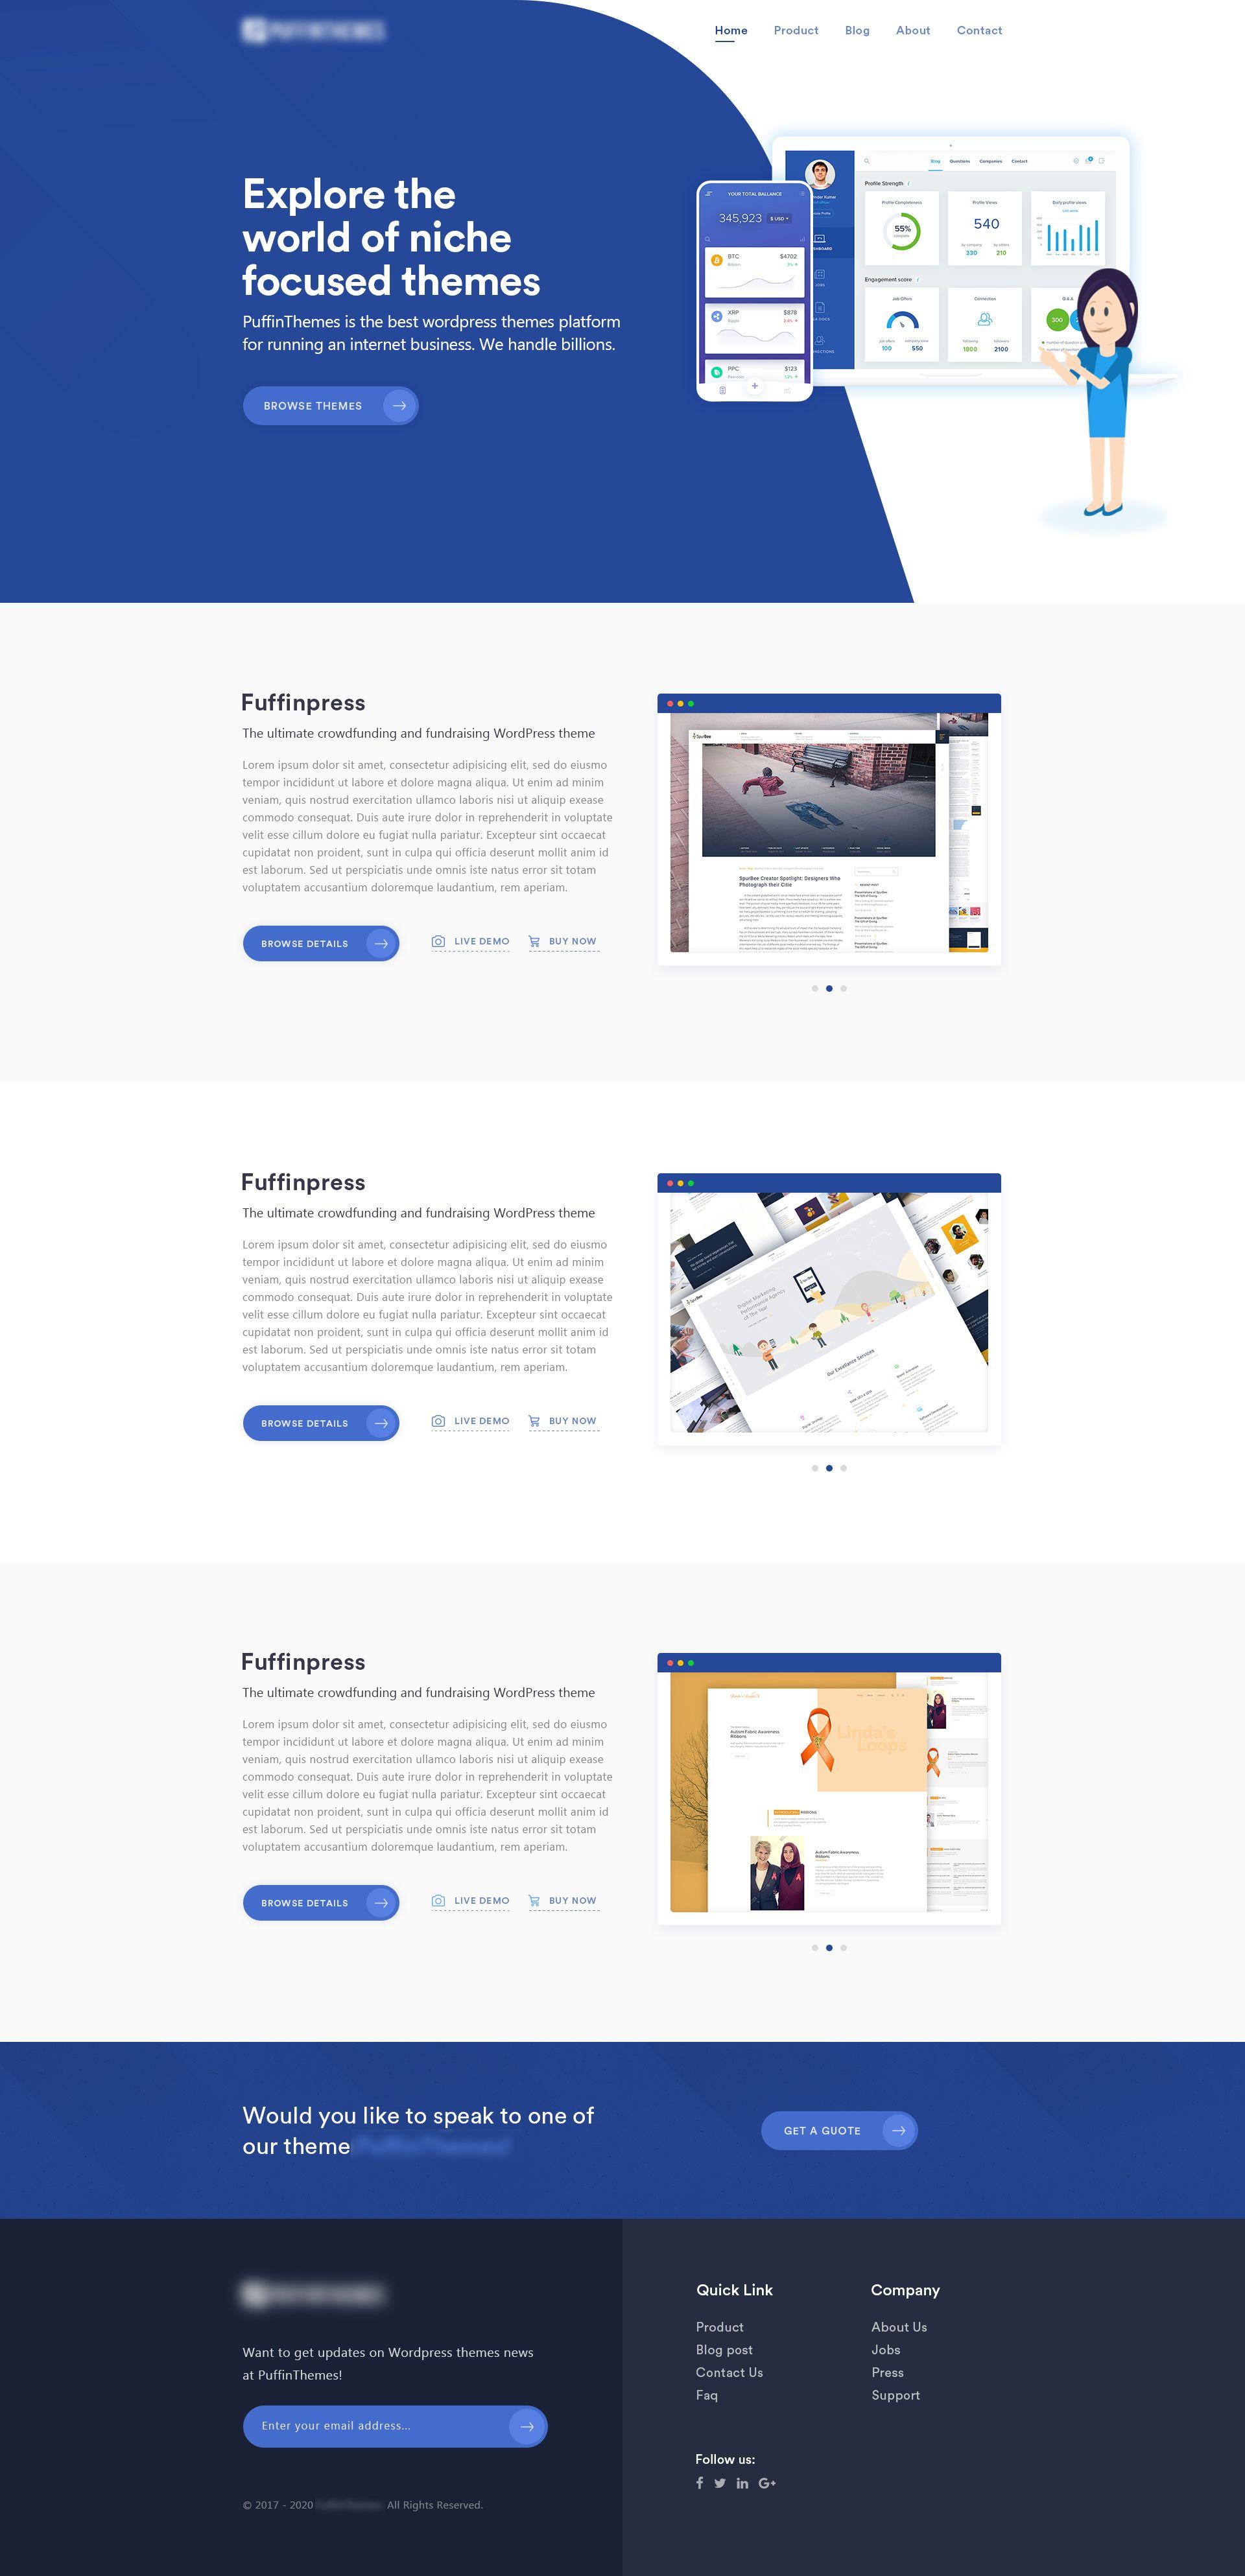 Theme Market Place Concept Landing Page Layout Site Website Layout Marketing